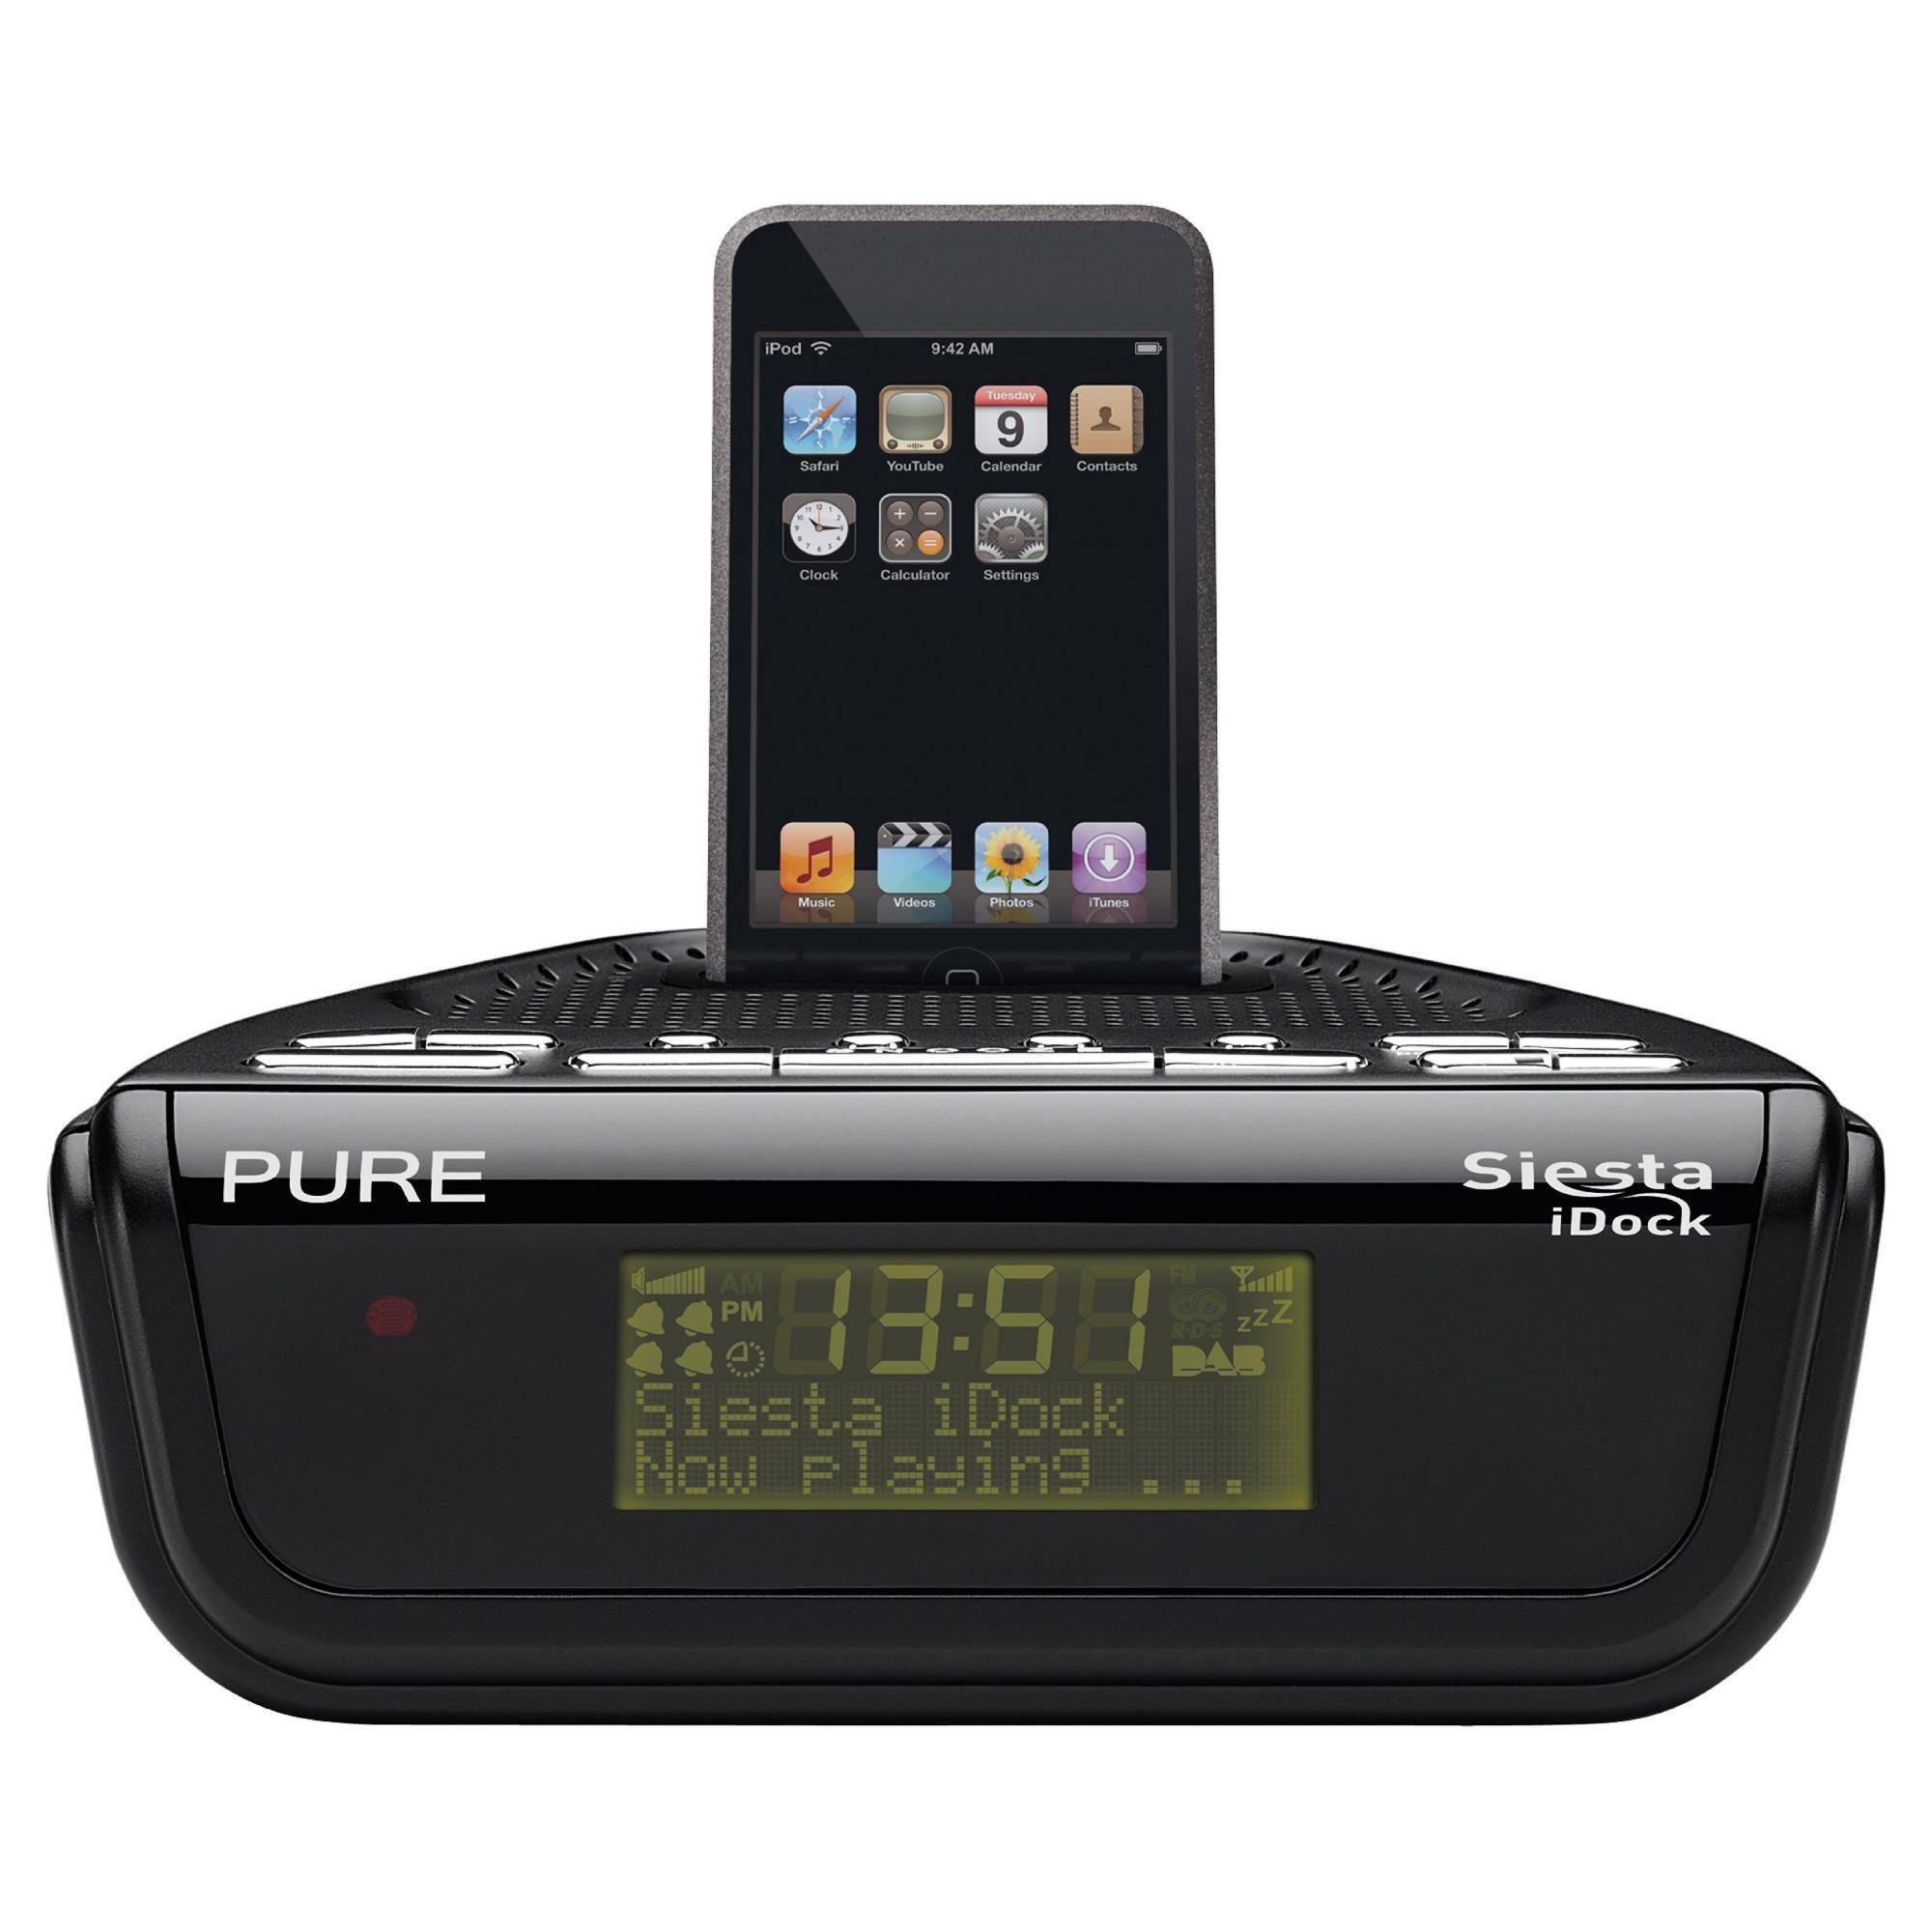 PURE SIESTA iDOCK DAB/FM/iPOD ALARM RADIO